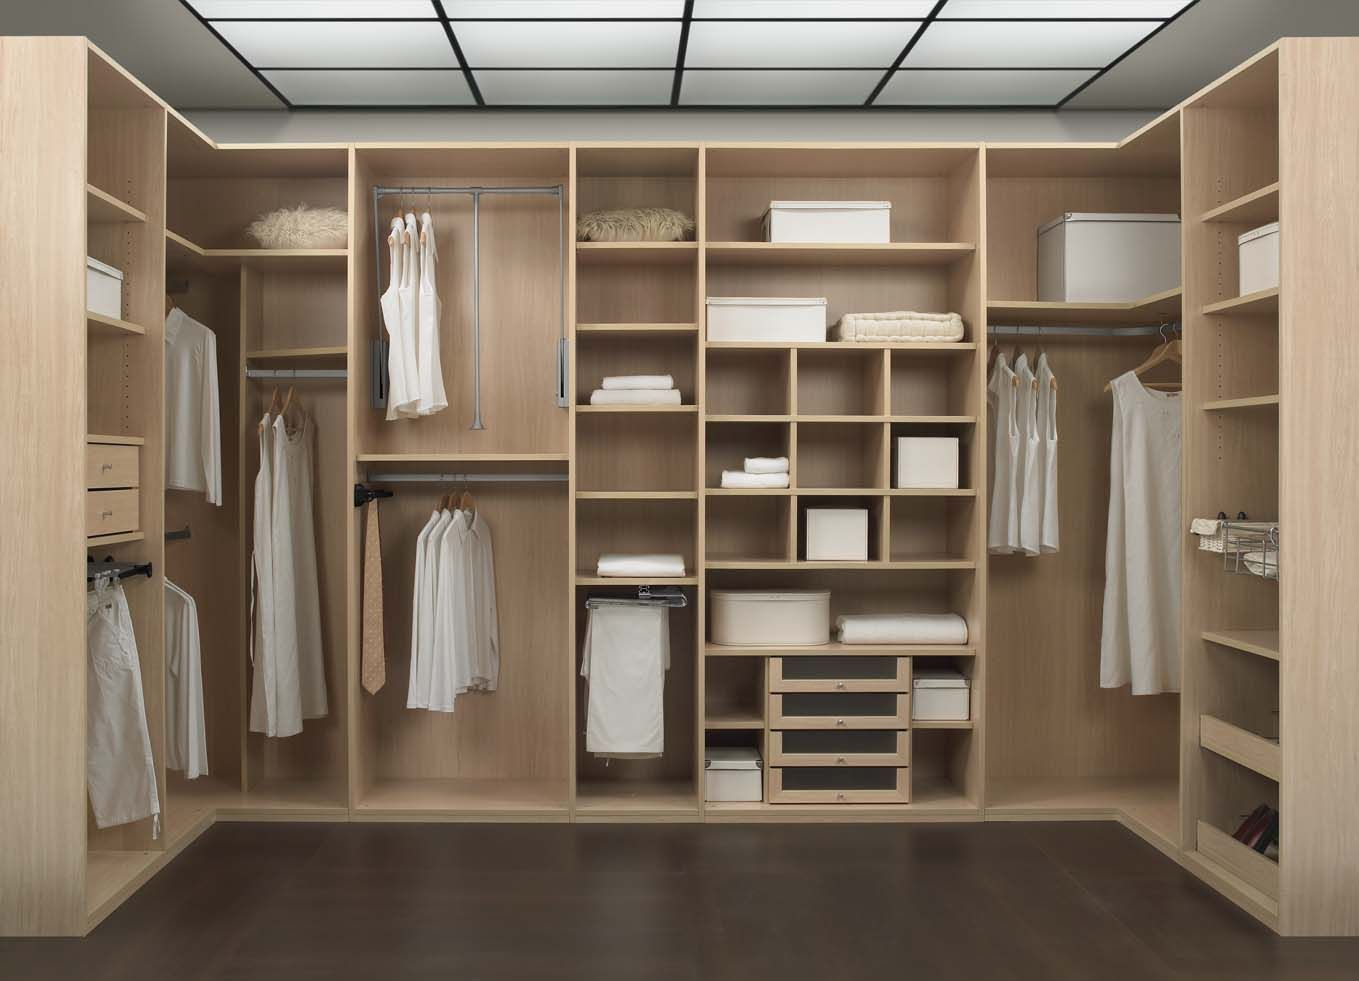 M s de 100 fotos de vestidores imagenes de vestidores for Closet modernos para hombres